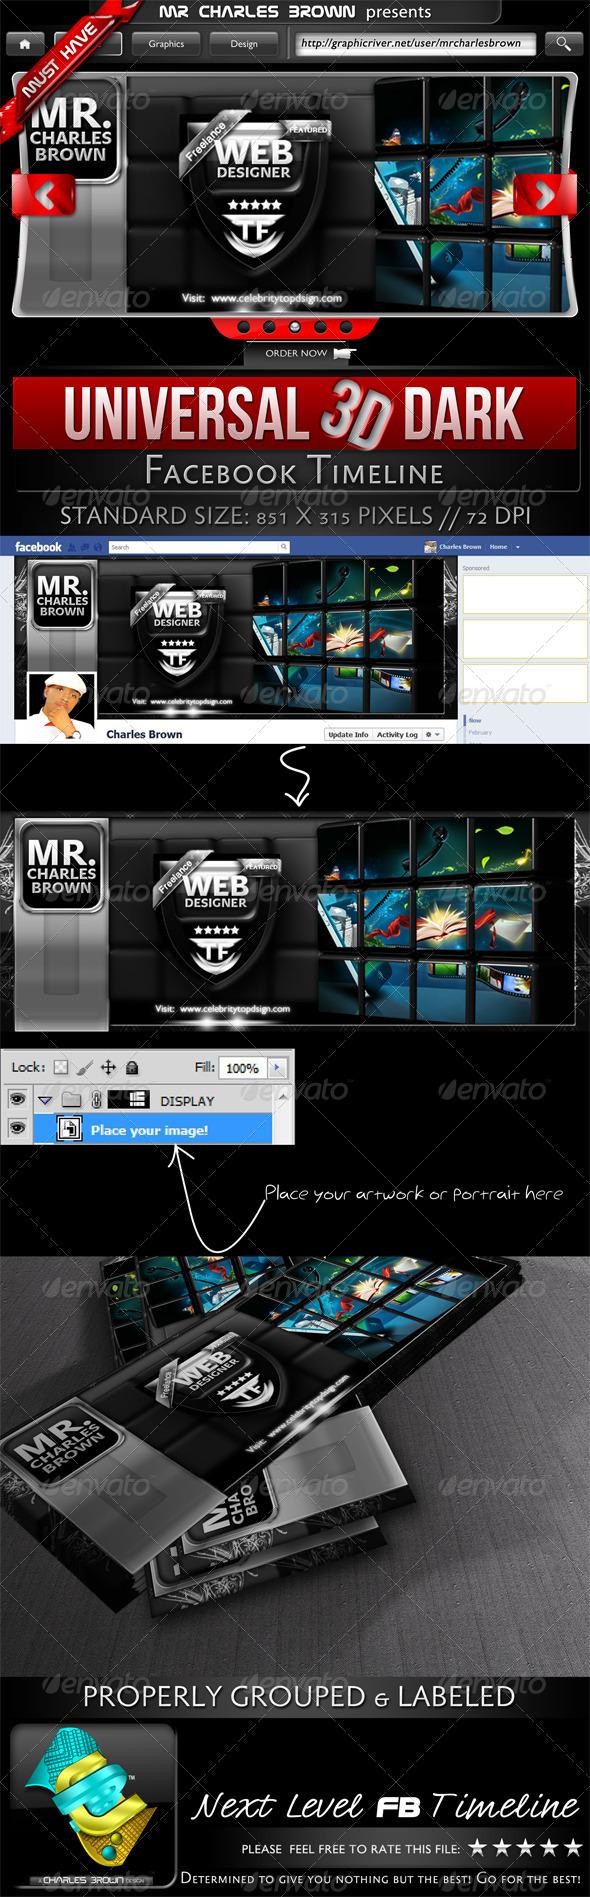 GraphicRiver Universal 3D Dark Facebook Timeline 2273732